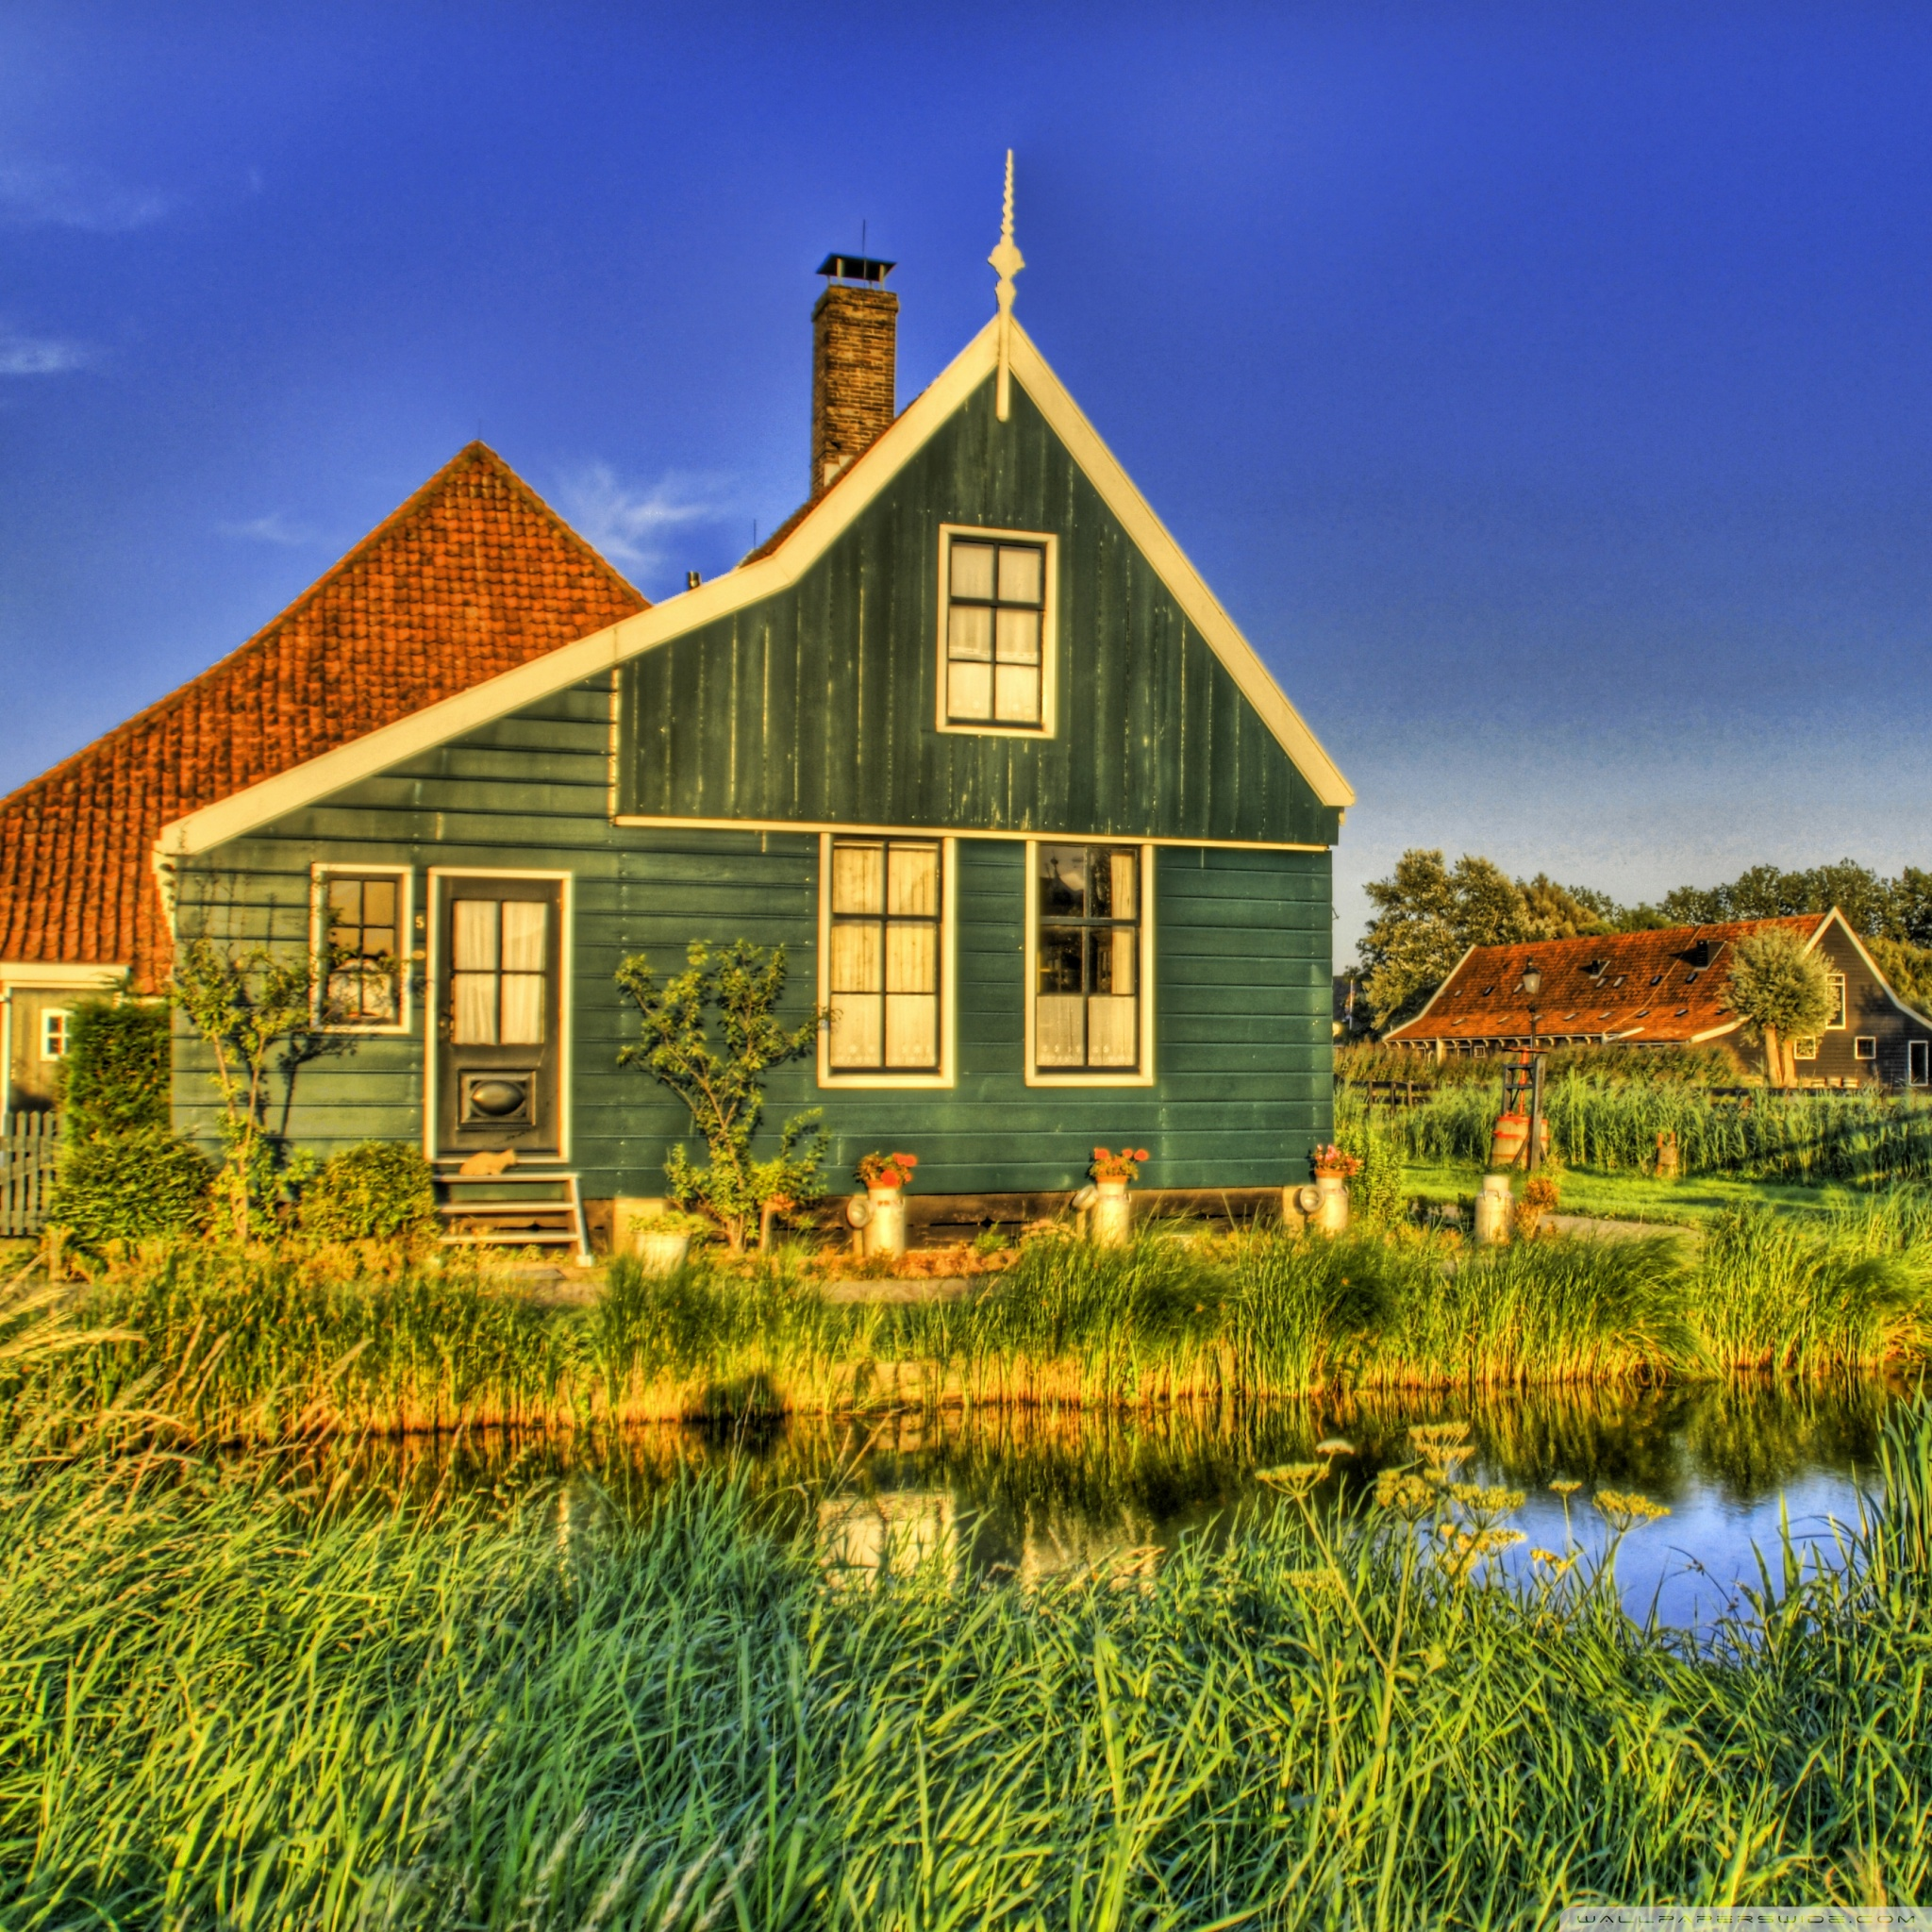 Holland Farmhouse 4K HD Desktop Wallpaper for 4K Ultra HD TV 2048x2048